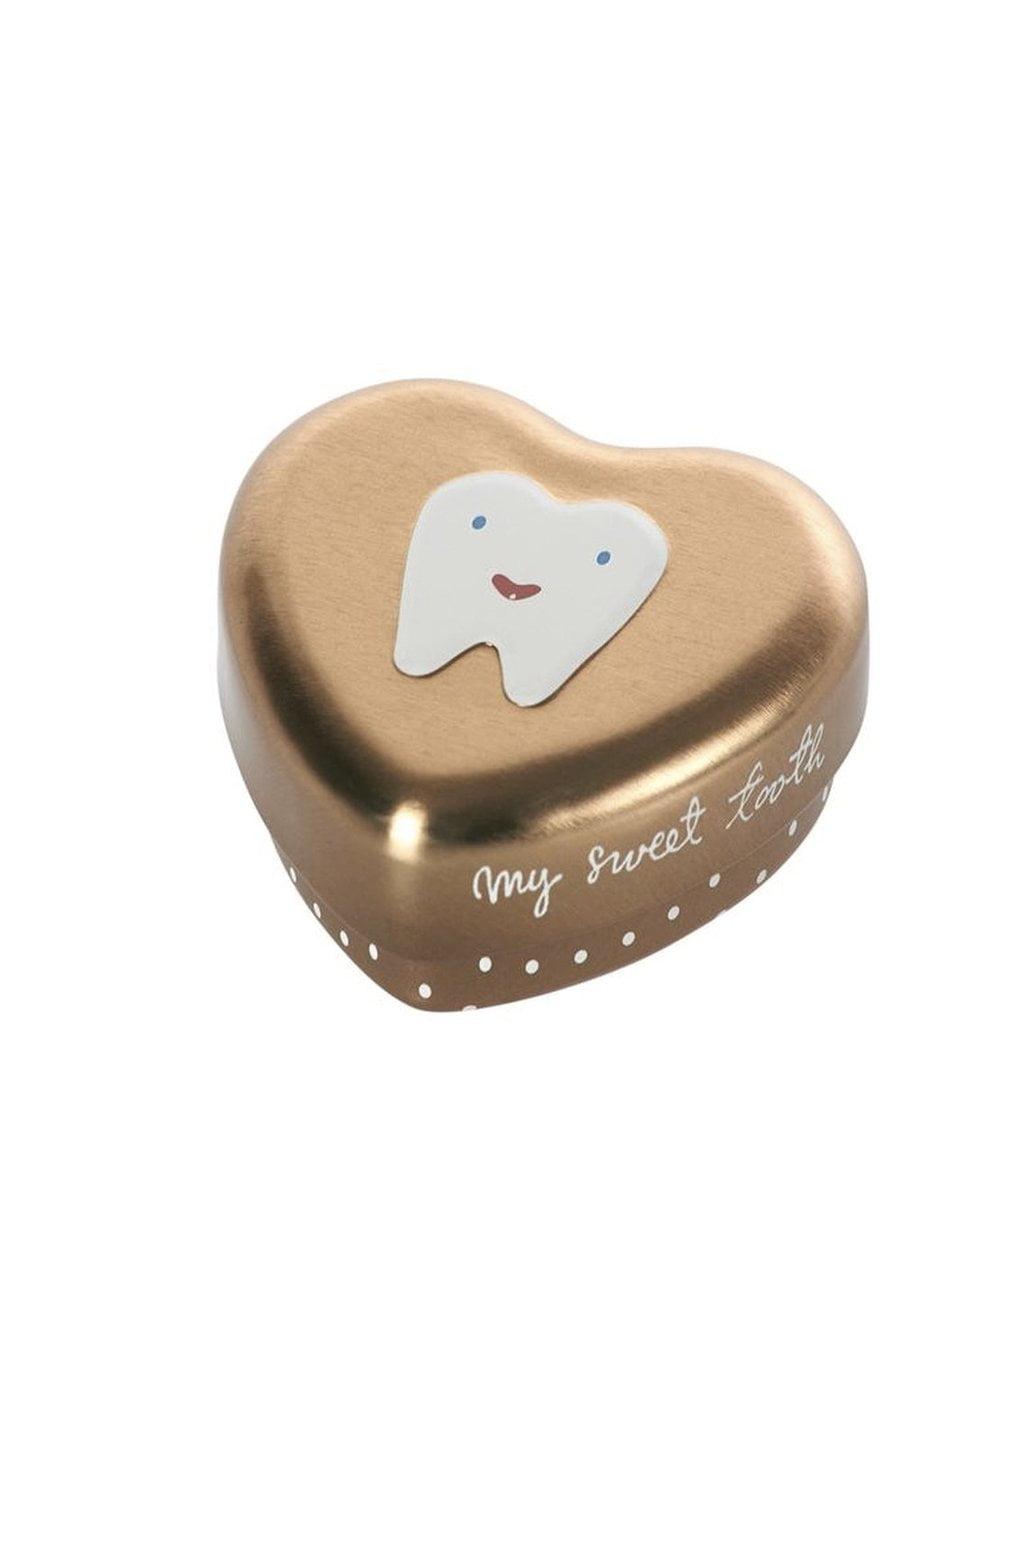 krabicka-zubky-zlata-dadaboom-sk